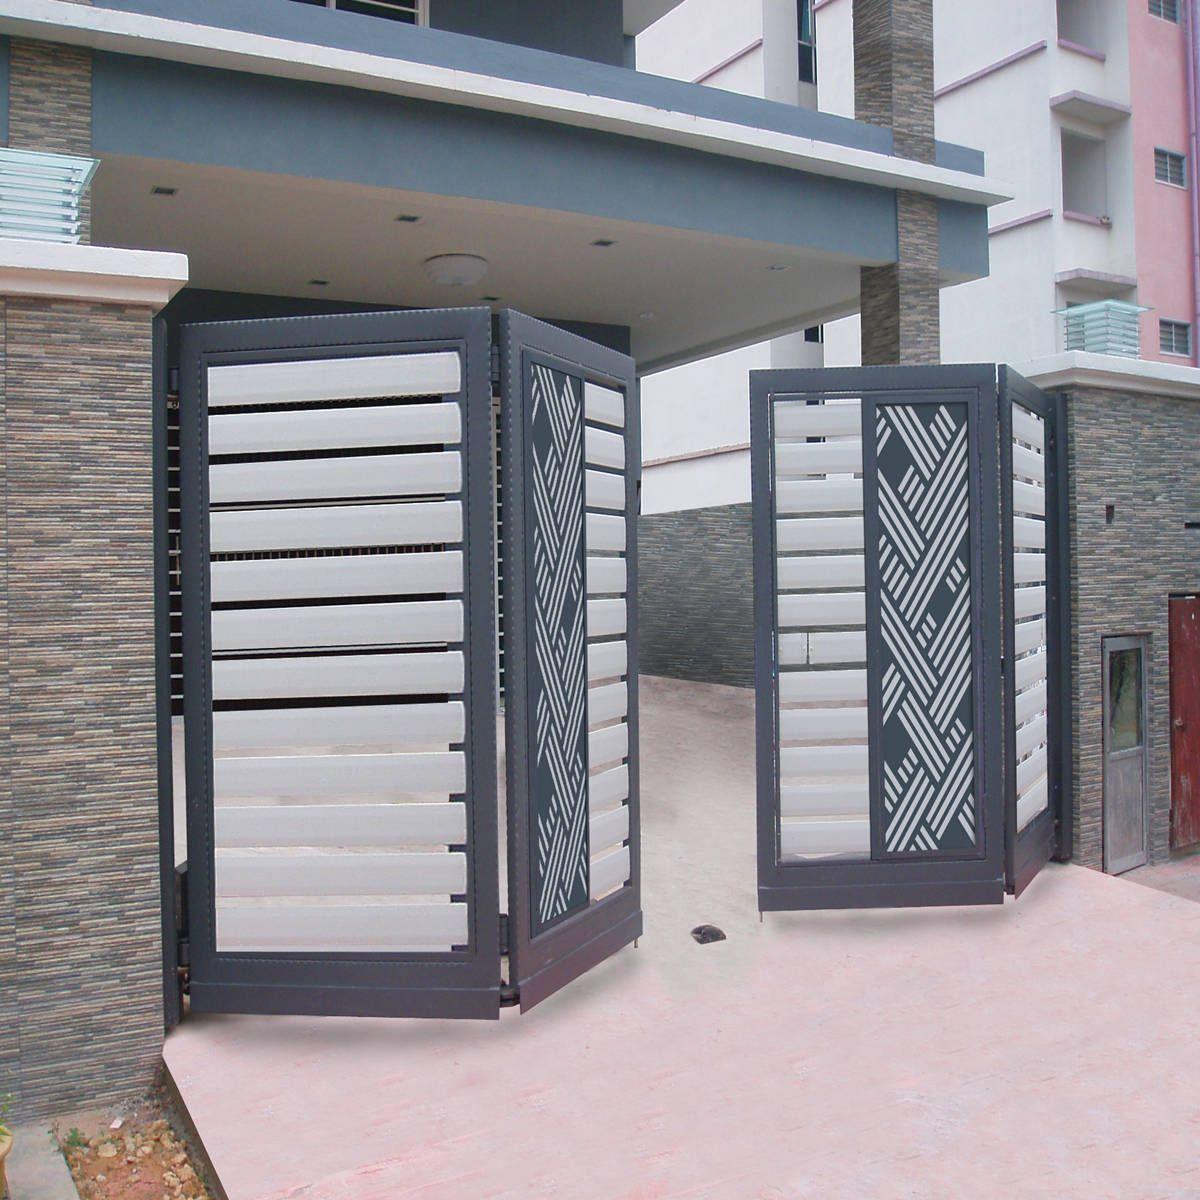 image2.jpg (1200×1200) | House gate design, Front gate ...